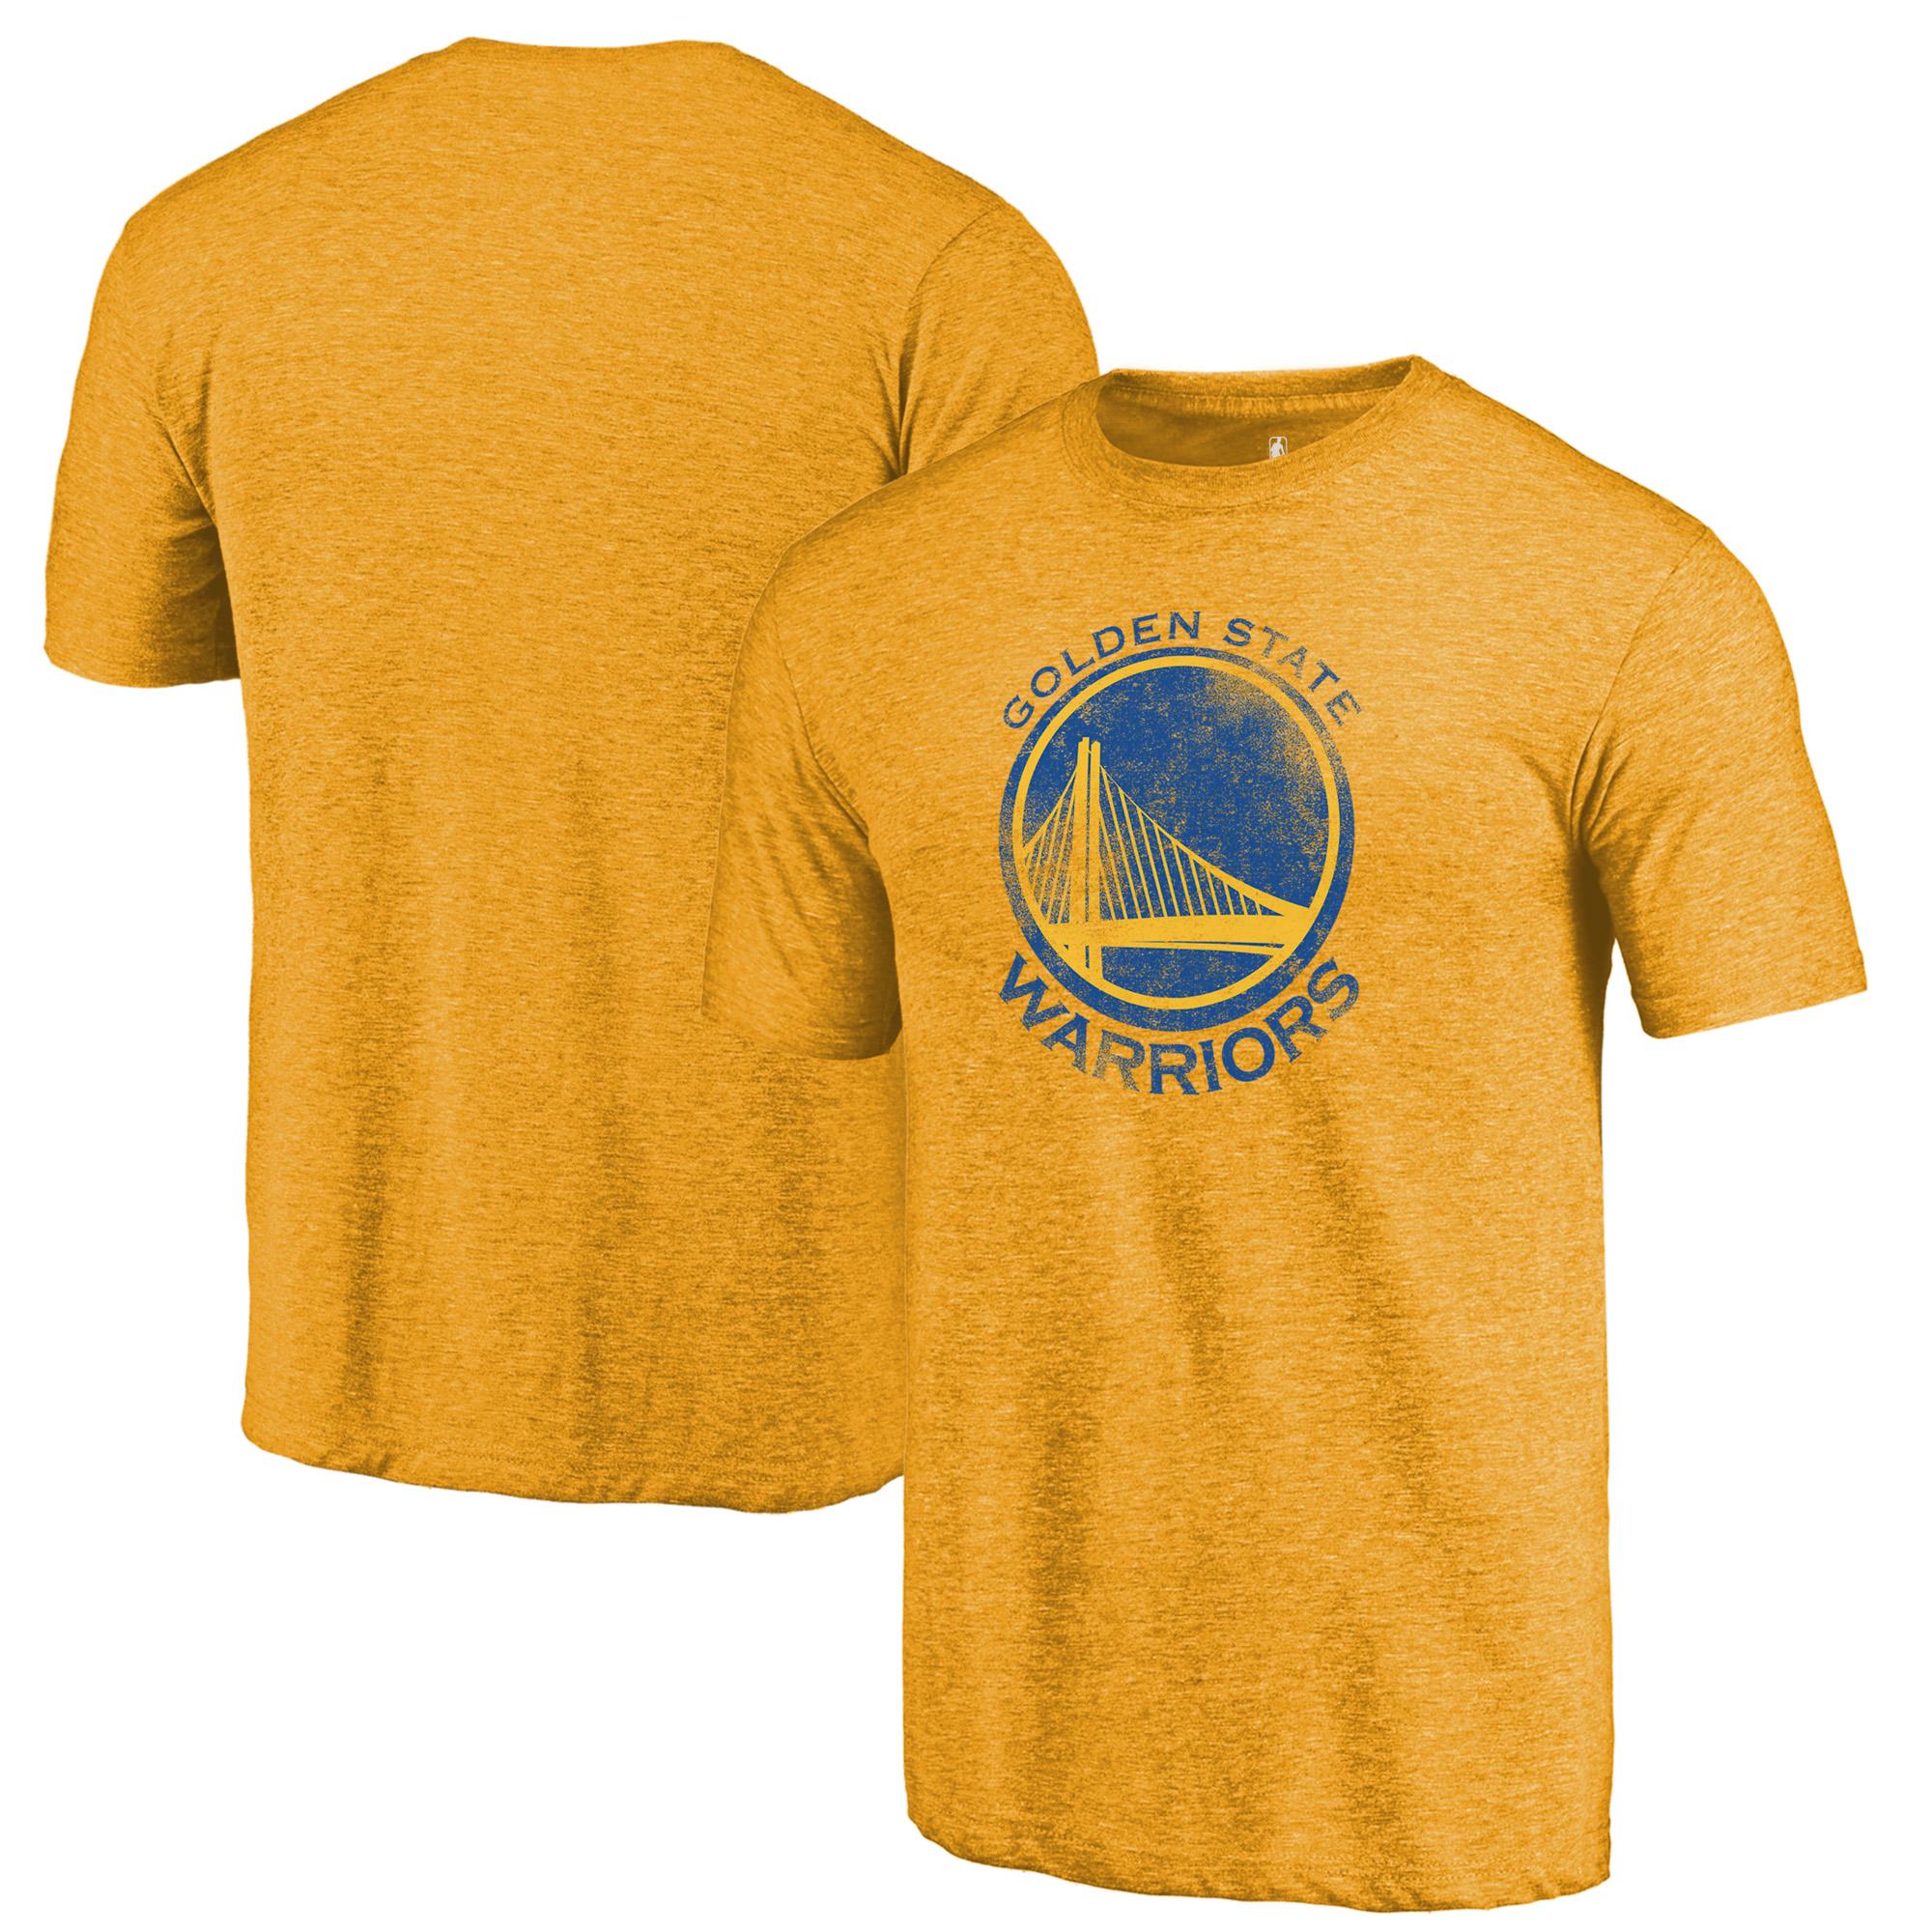 Golden State Warriors Fanatics Branded Distressed Logo Tri-Blend T-Shirt - Gold